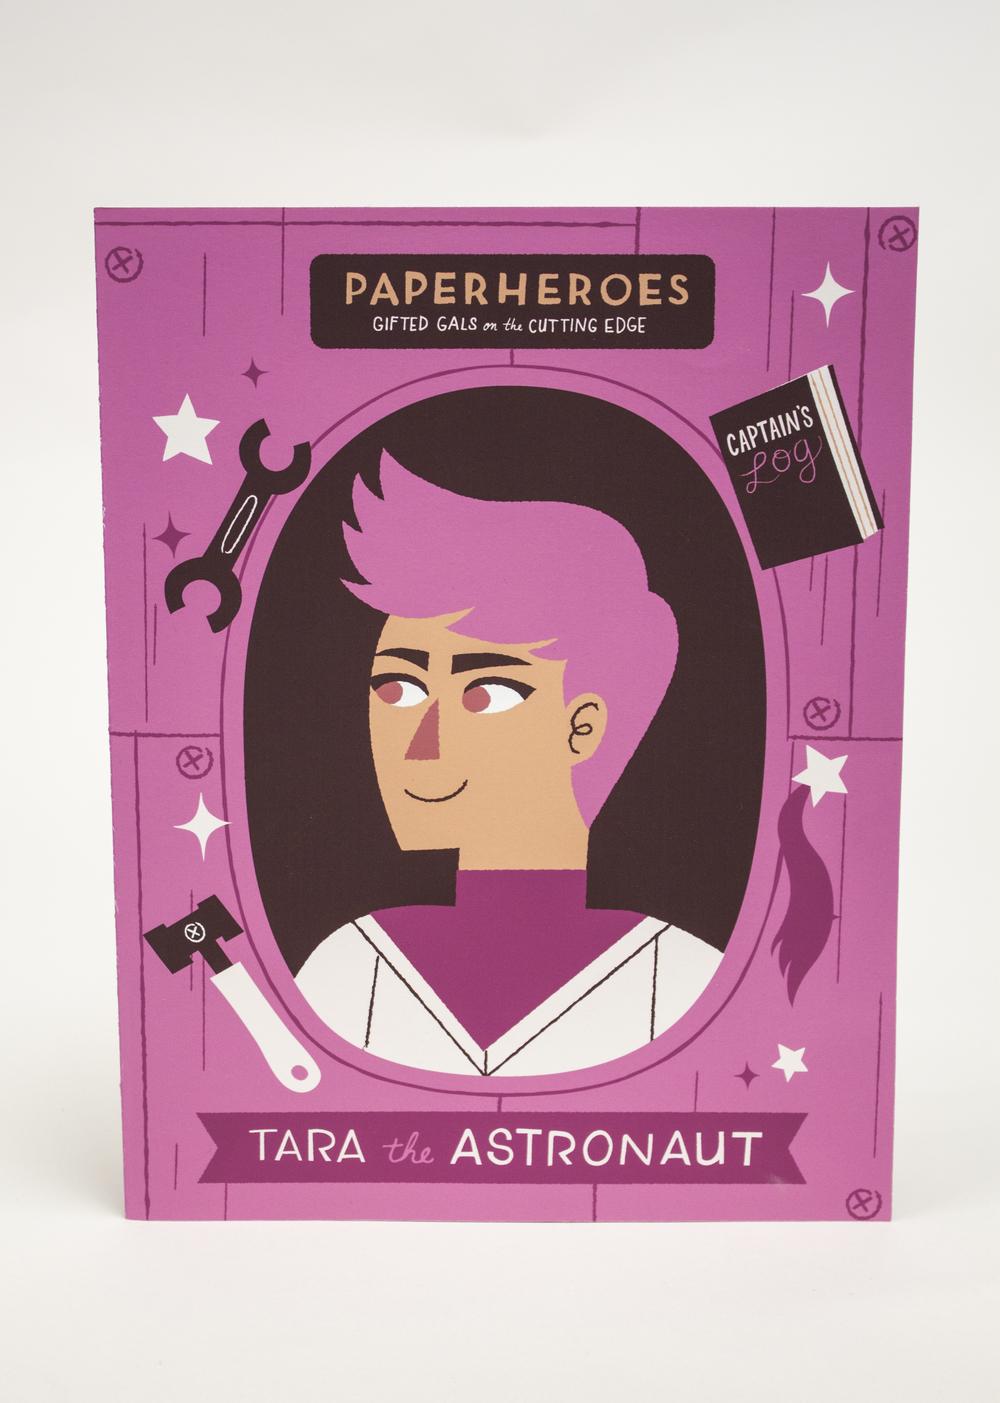 paperheroes_set_astronaut_cover.jpg